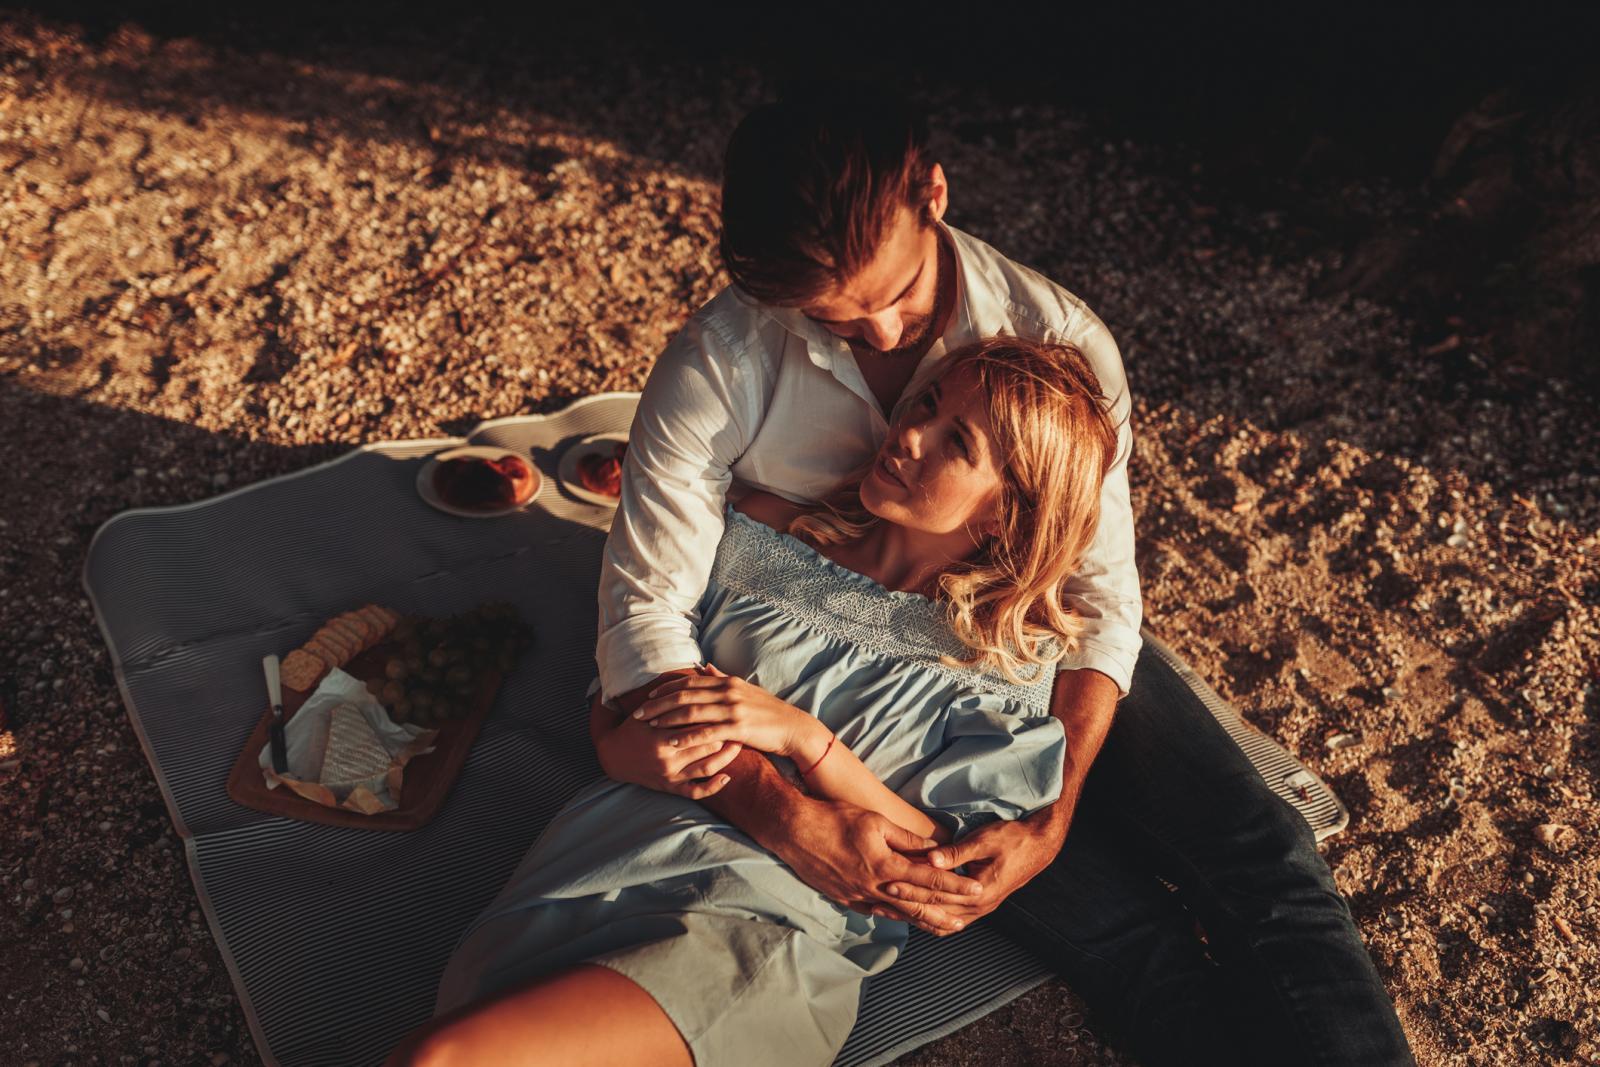 Na samom početku veze nas privuče partnerov šarm, karizma, način ophođenja prema nama i prividan interes za nas i druge.